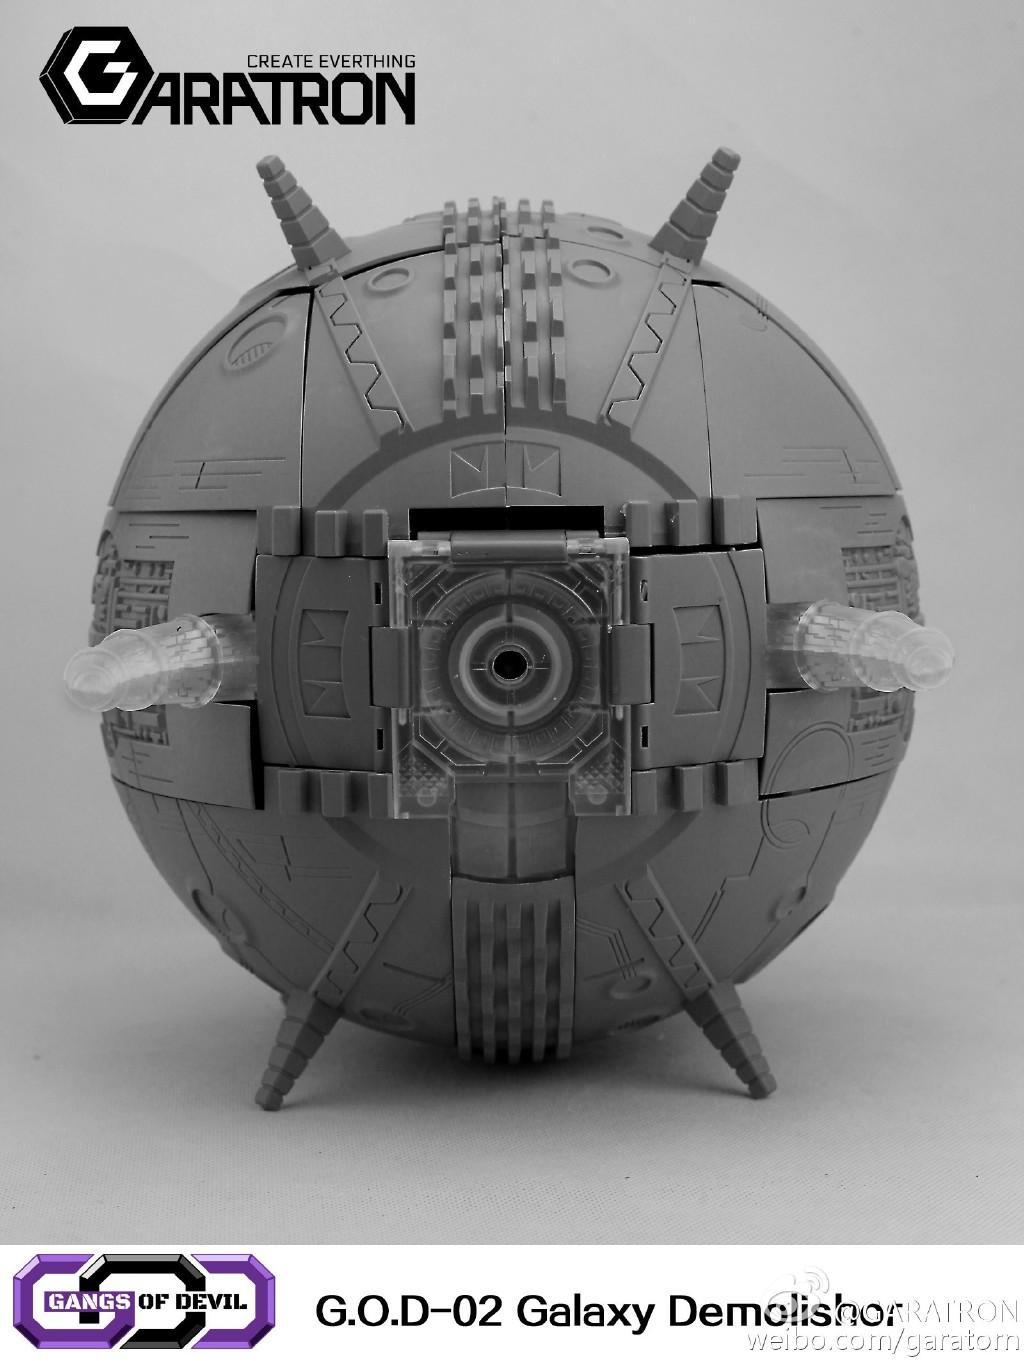 [Garatron] Produit Tiers - Gangs Of Devils G.O.D-02 Galaxy Demolishor - aka Unicron (Beast Wars Neo) Uni15